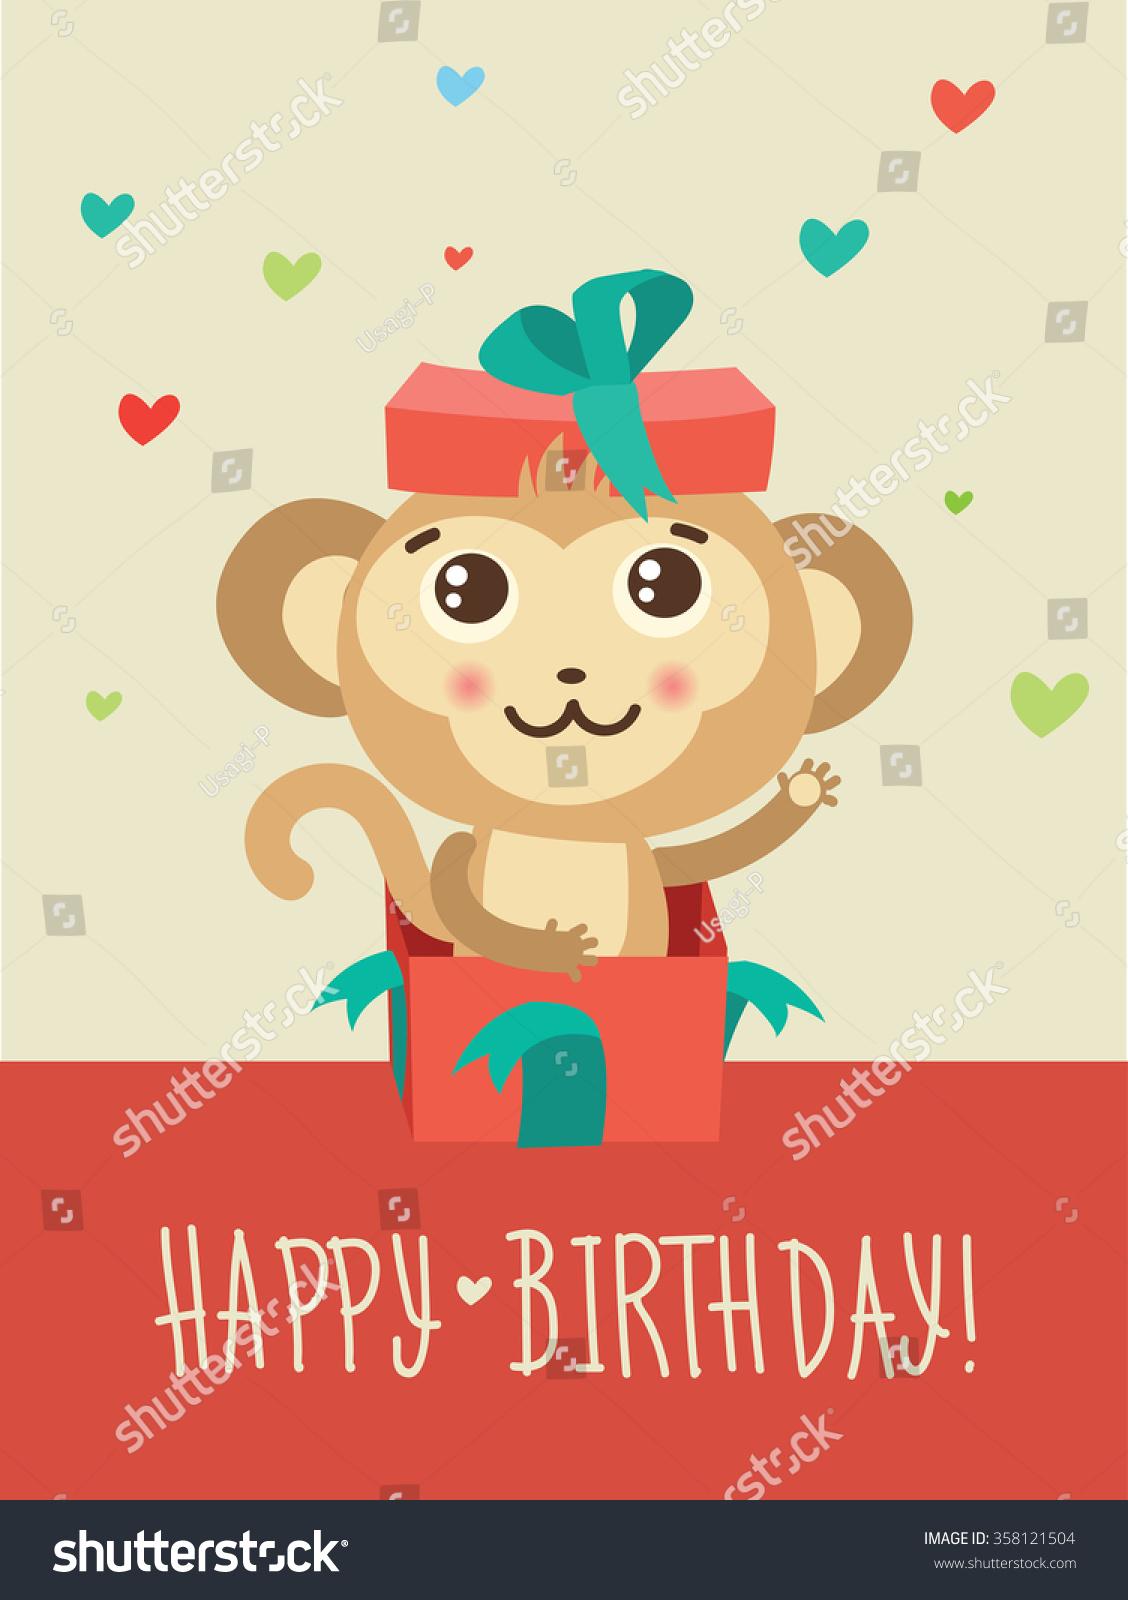 Happy Birthday Card Funny Monkey Surprise Vector 358121504 – Birthday Card Monkey